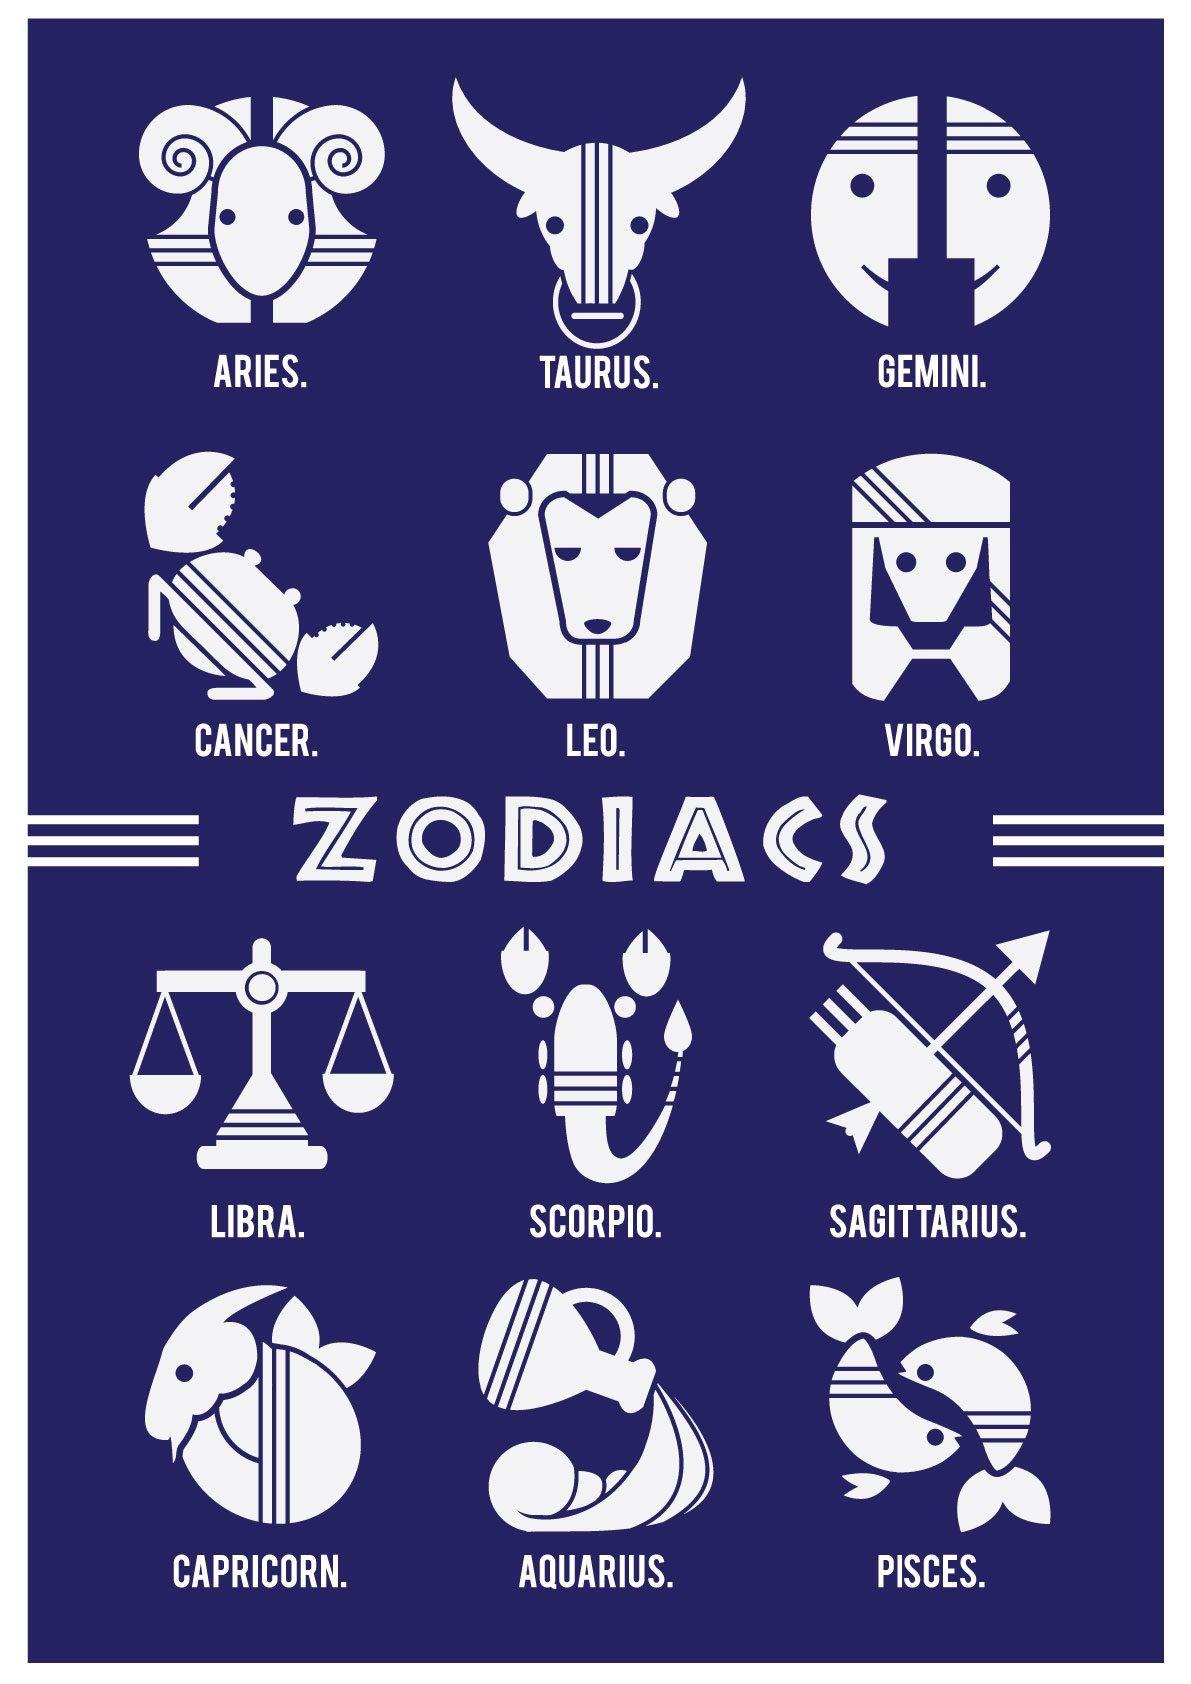 12 Zodiac Signs The Magnificent Zodiac Pinterest 12 Zodiac